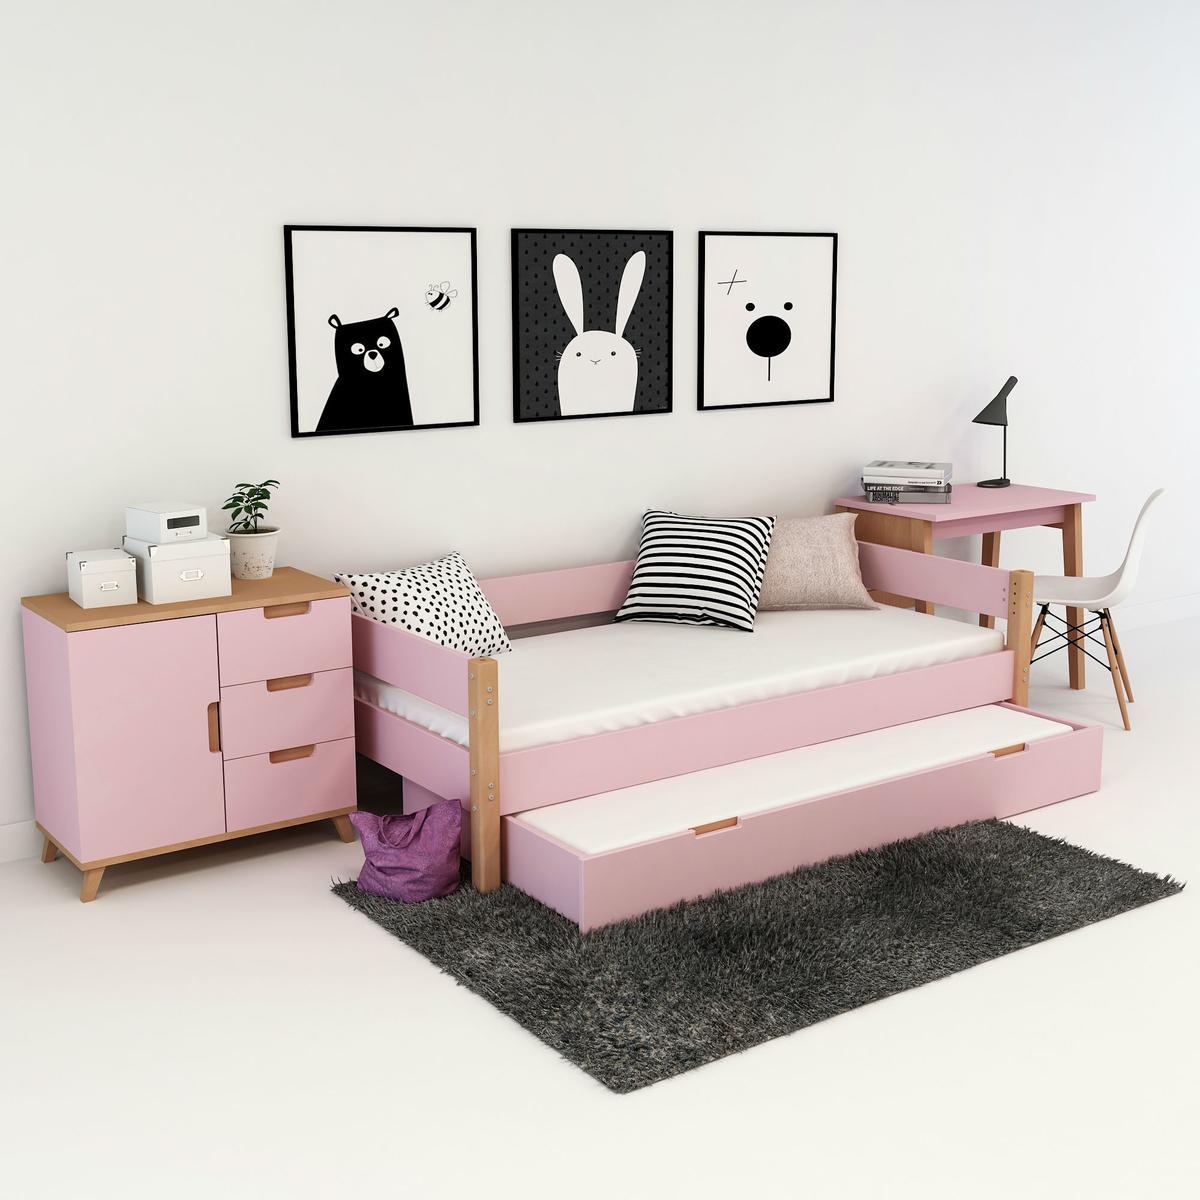 kinderbett jugenbett colorland mit ausziehbarer g stebett. Black Bedroom Furniture Sets. Home Design Ideas